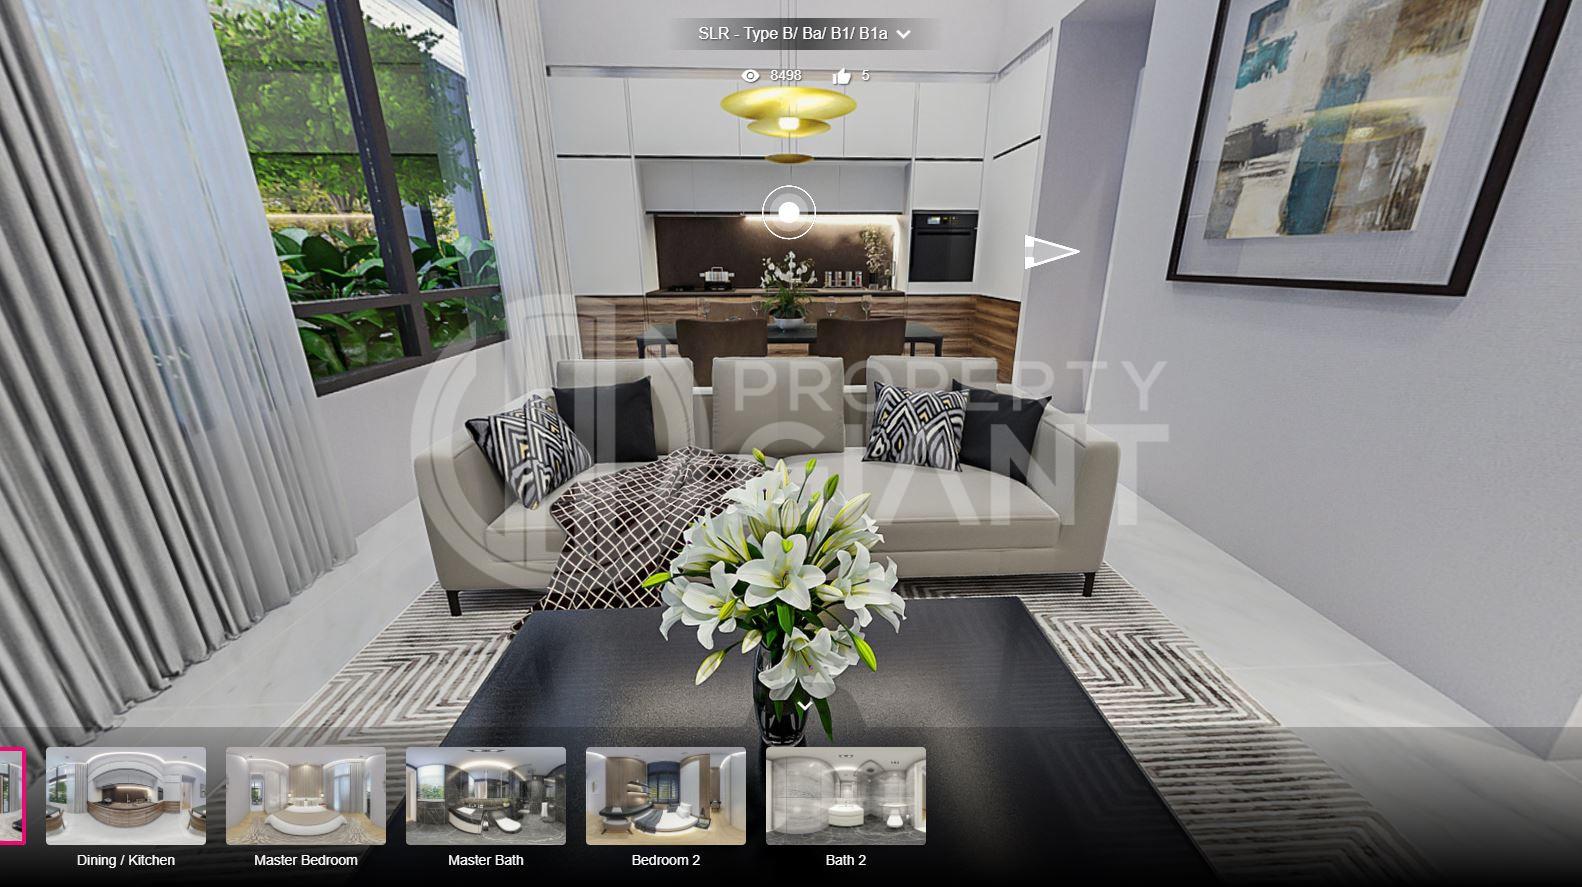 3D Virtual Tour of Sloane Residences 2 Bedroom Unit, Type B/Ba/B1/B1a